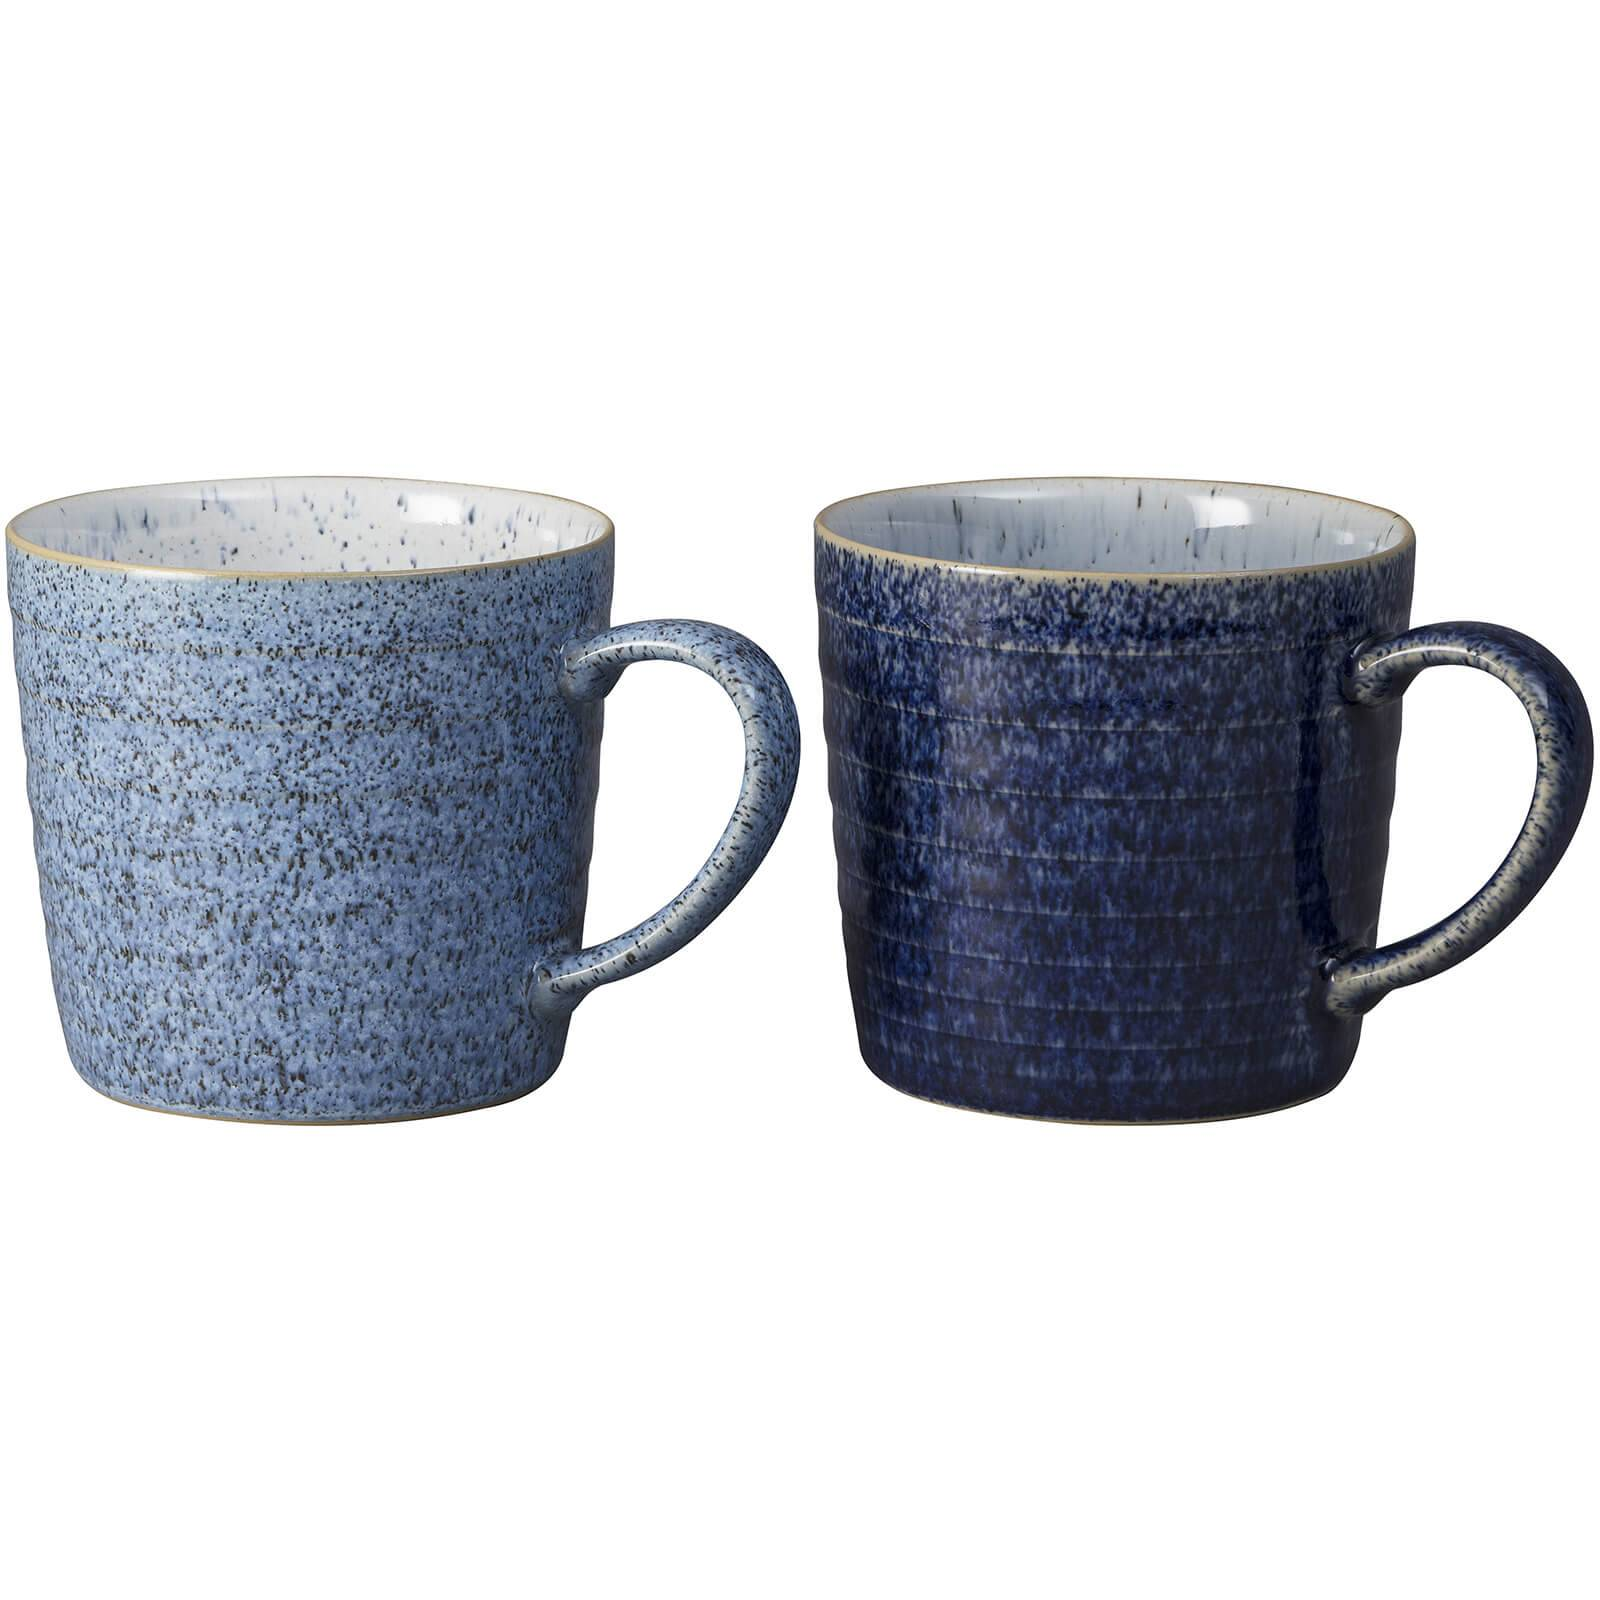 Denby Studio Blue 2 Piece Ridged Mug Set